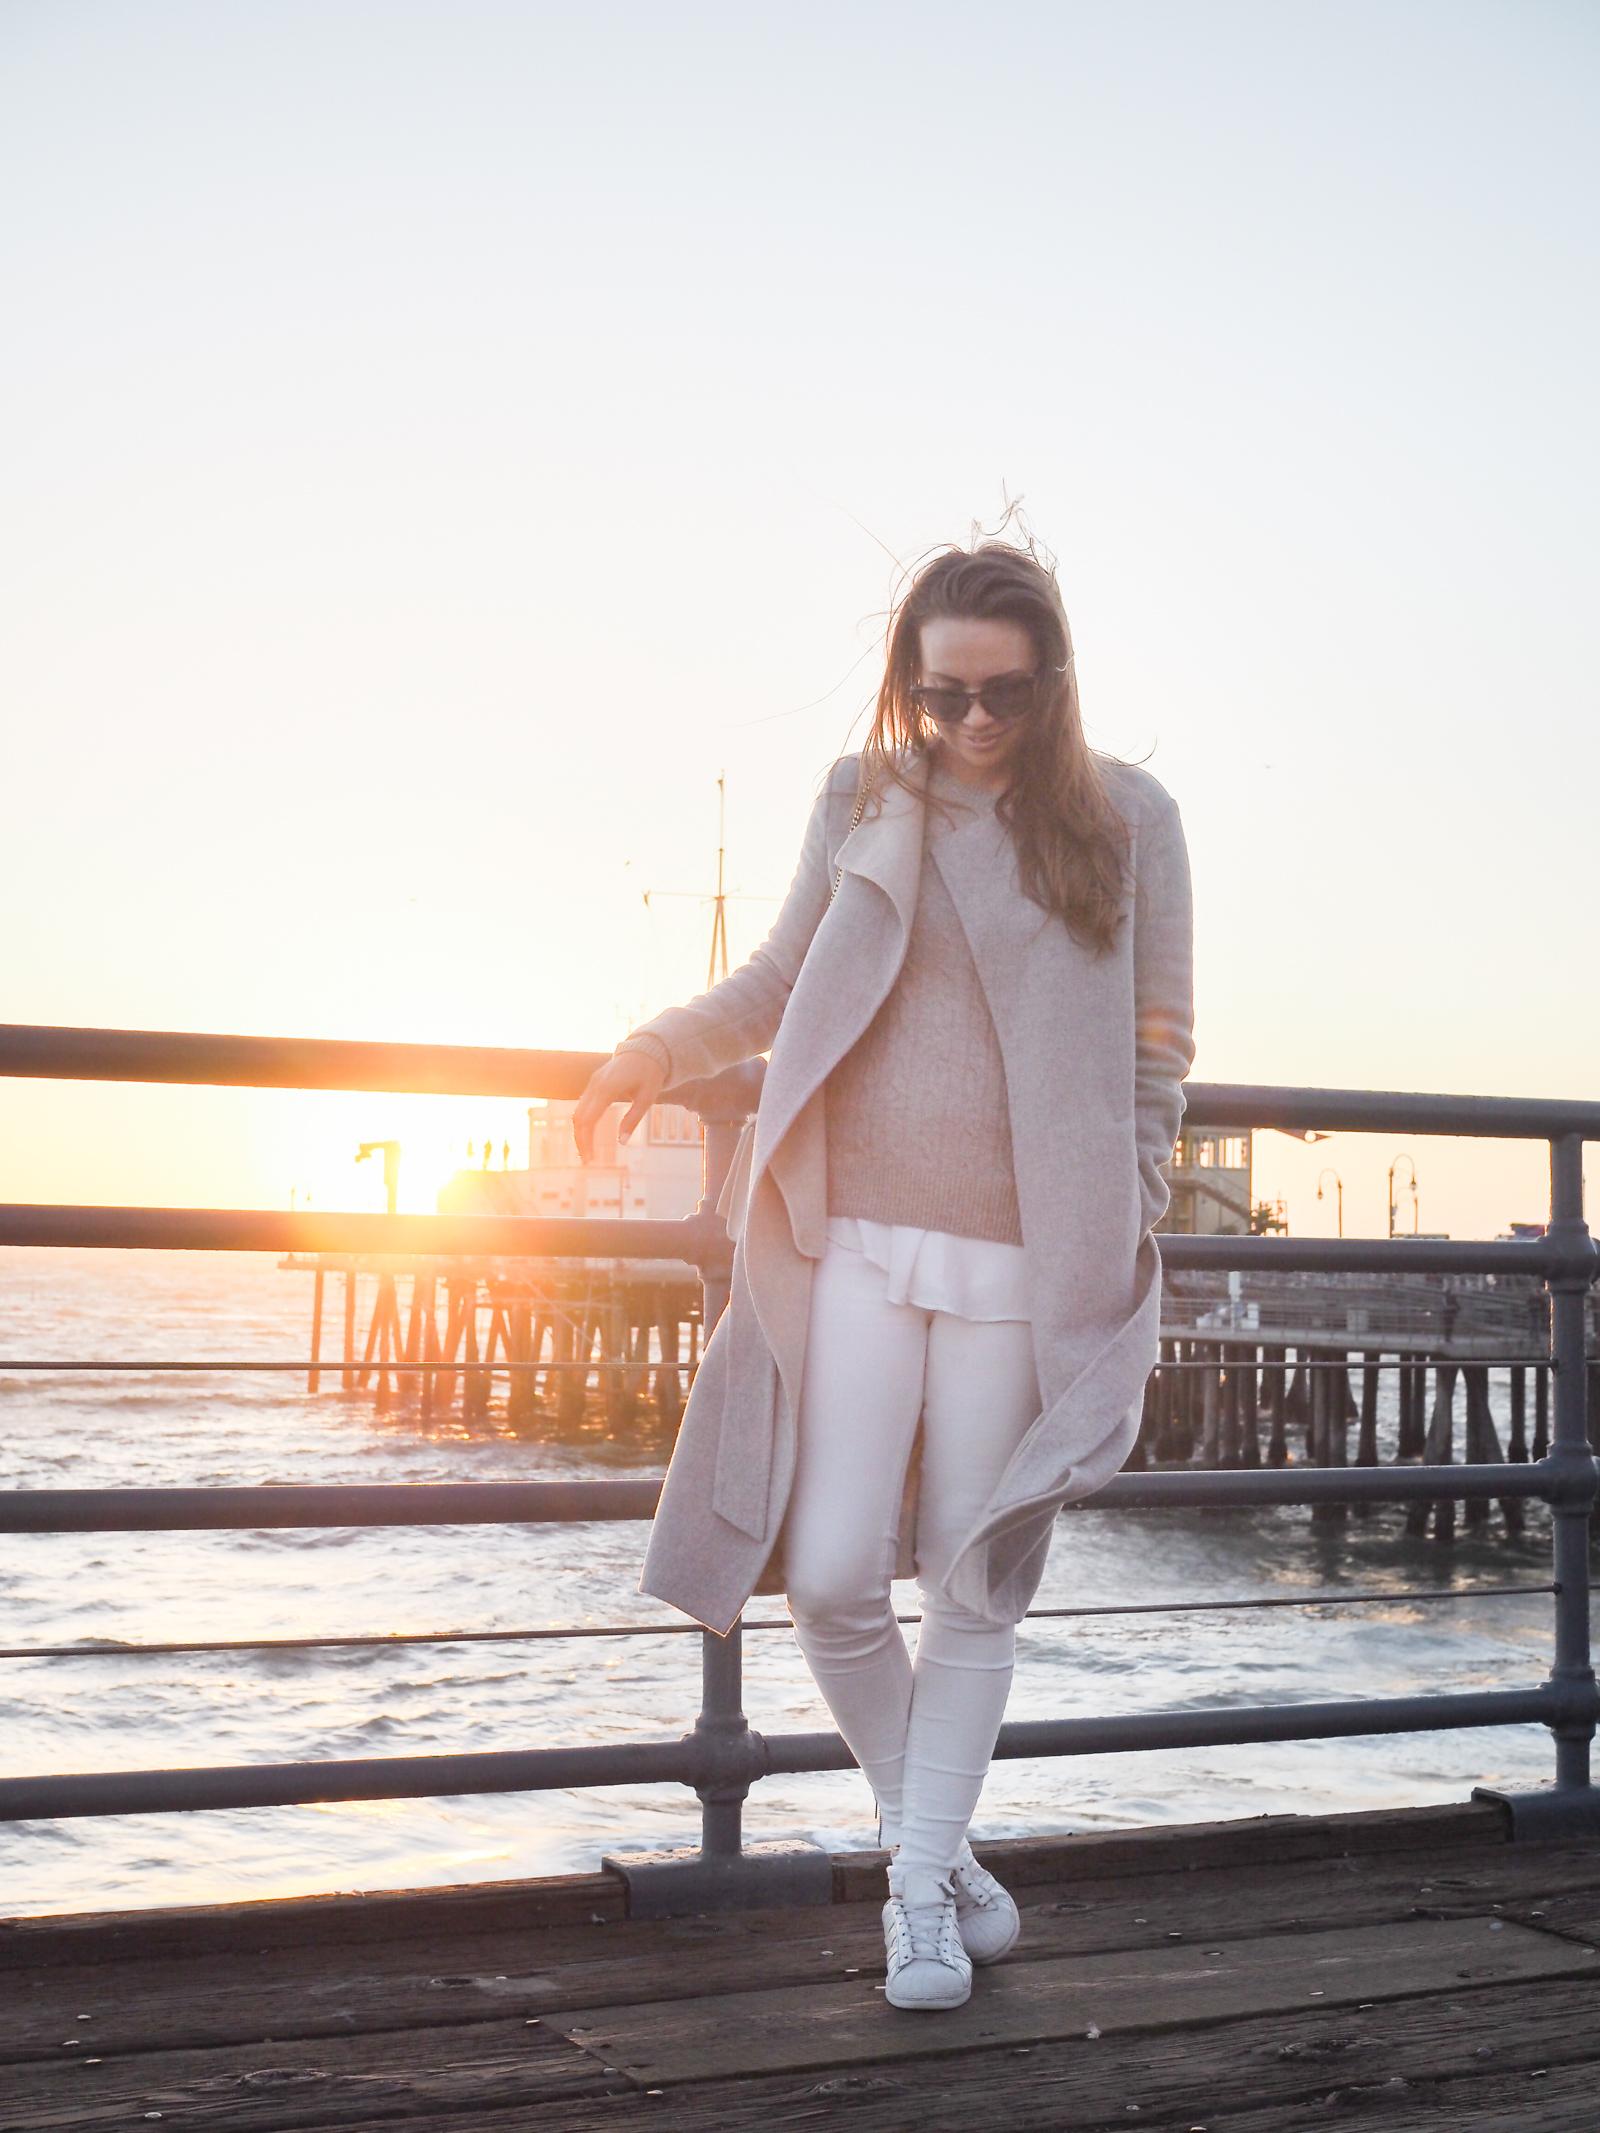 santa monica pier outfit metti-1230915